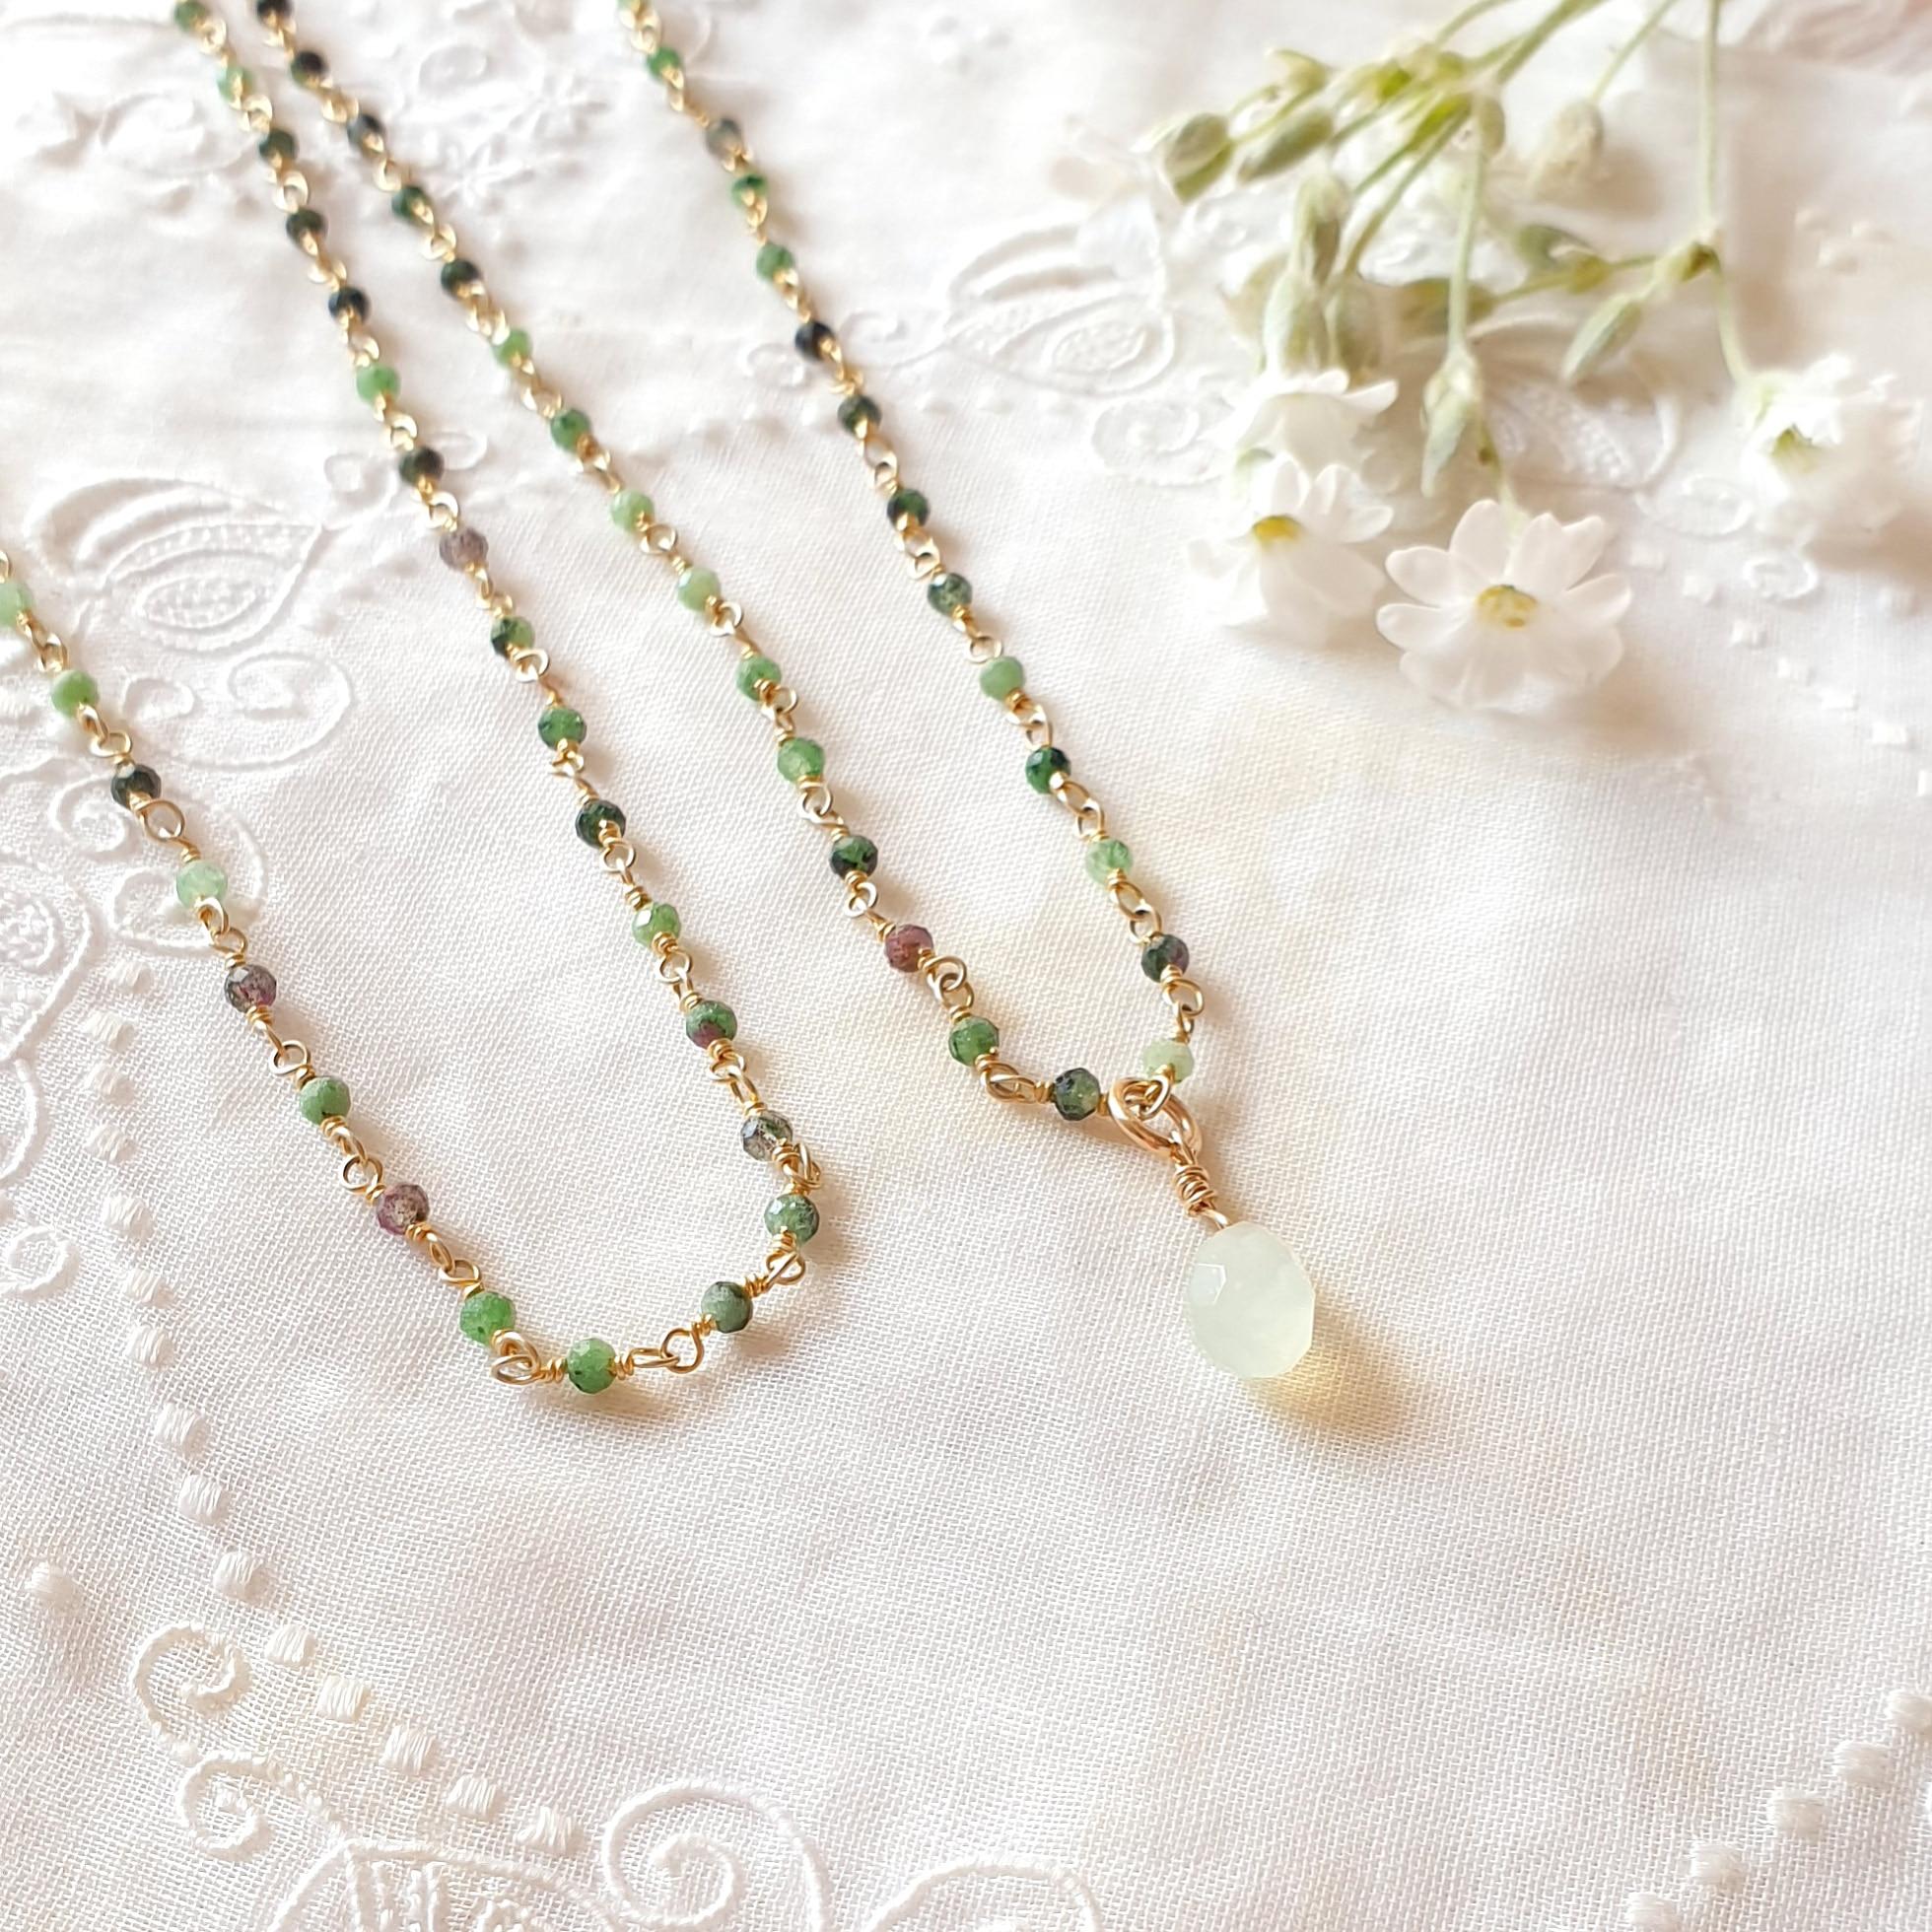 LUMINEUSE rubis zoïsite (vert) or